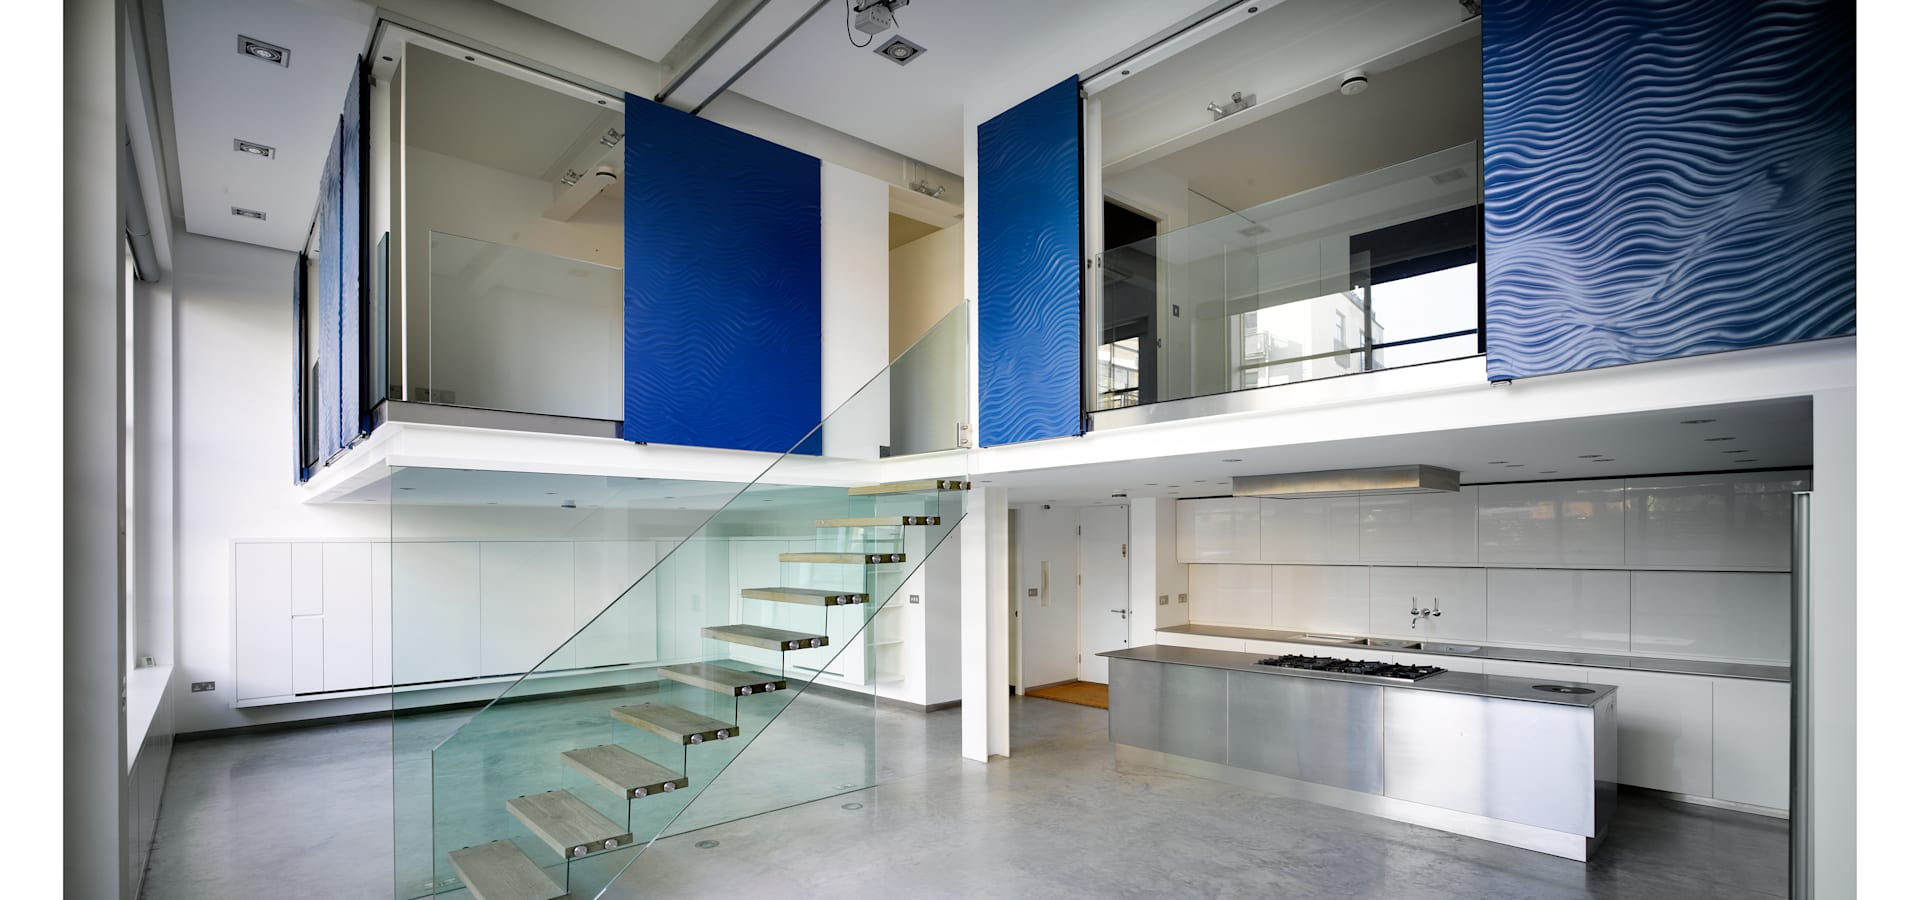 Syte Architects